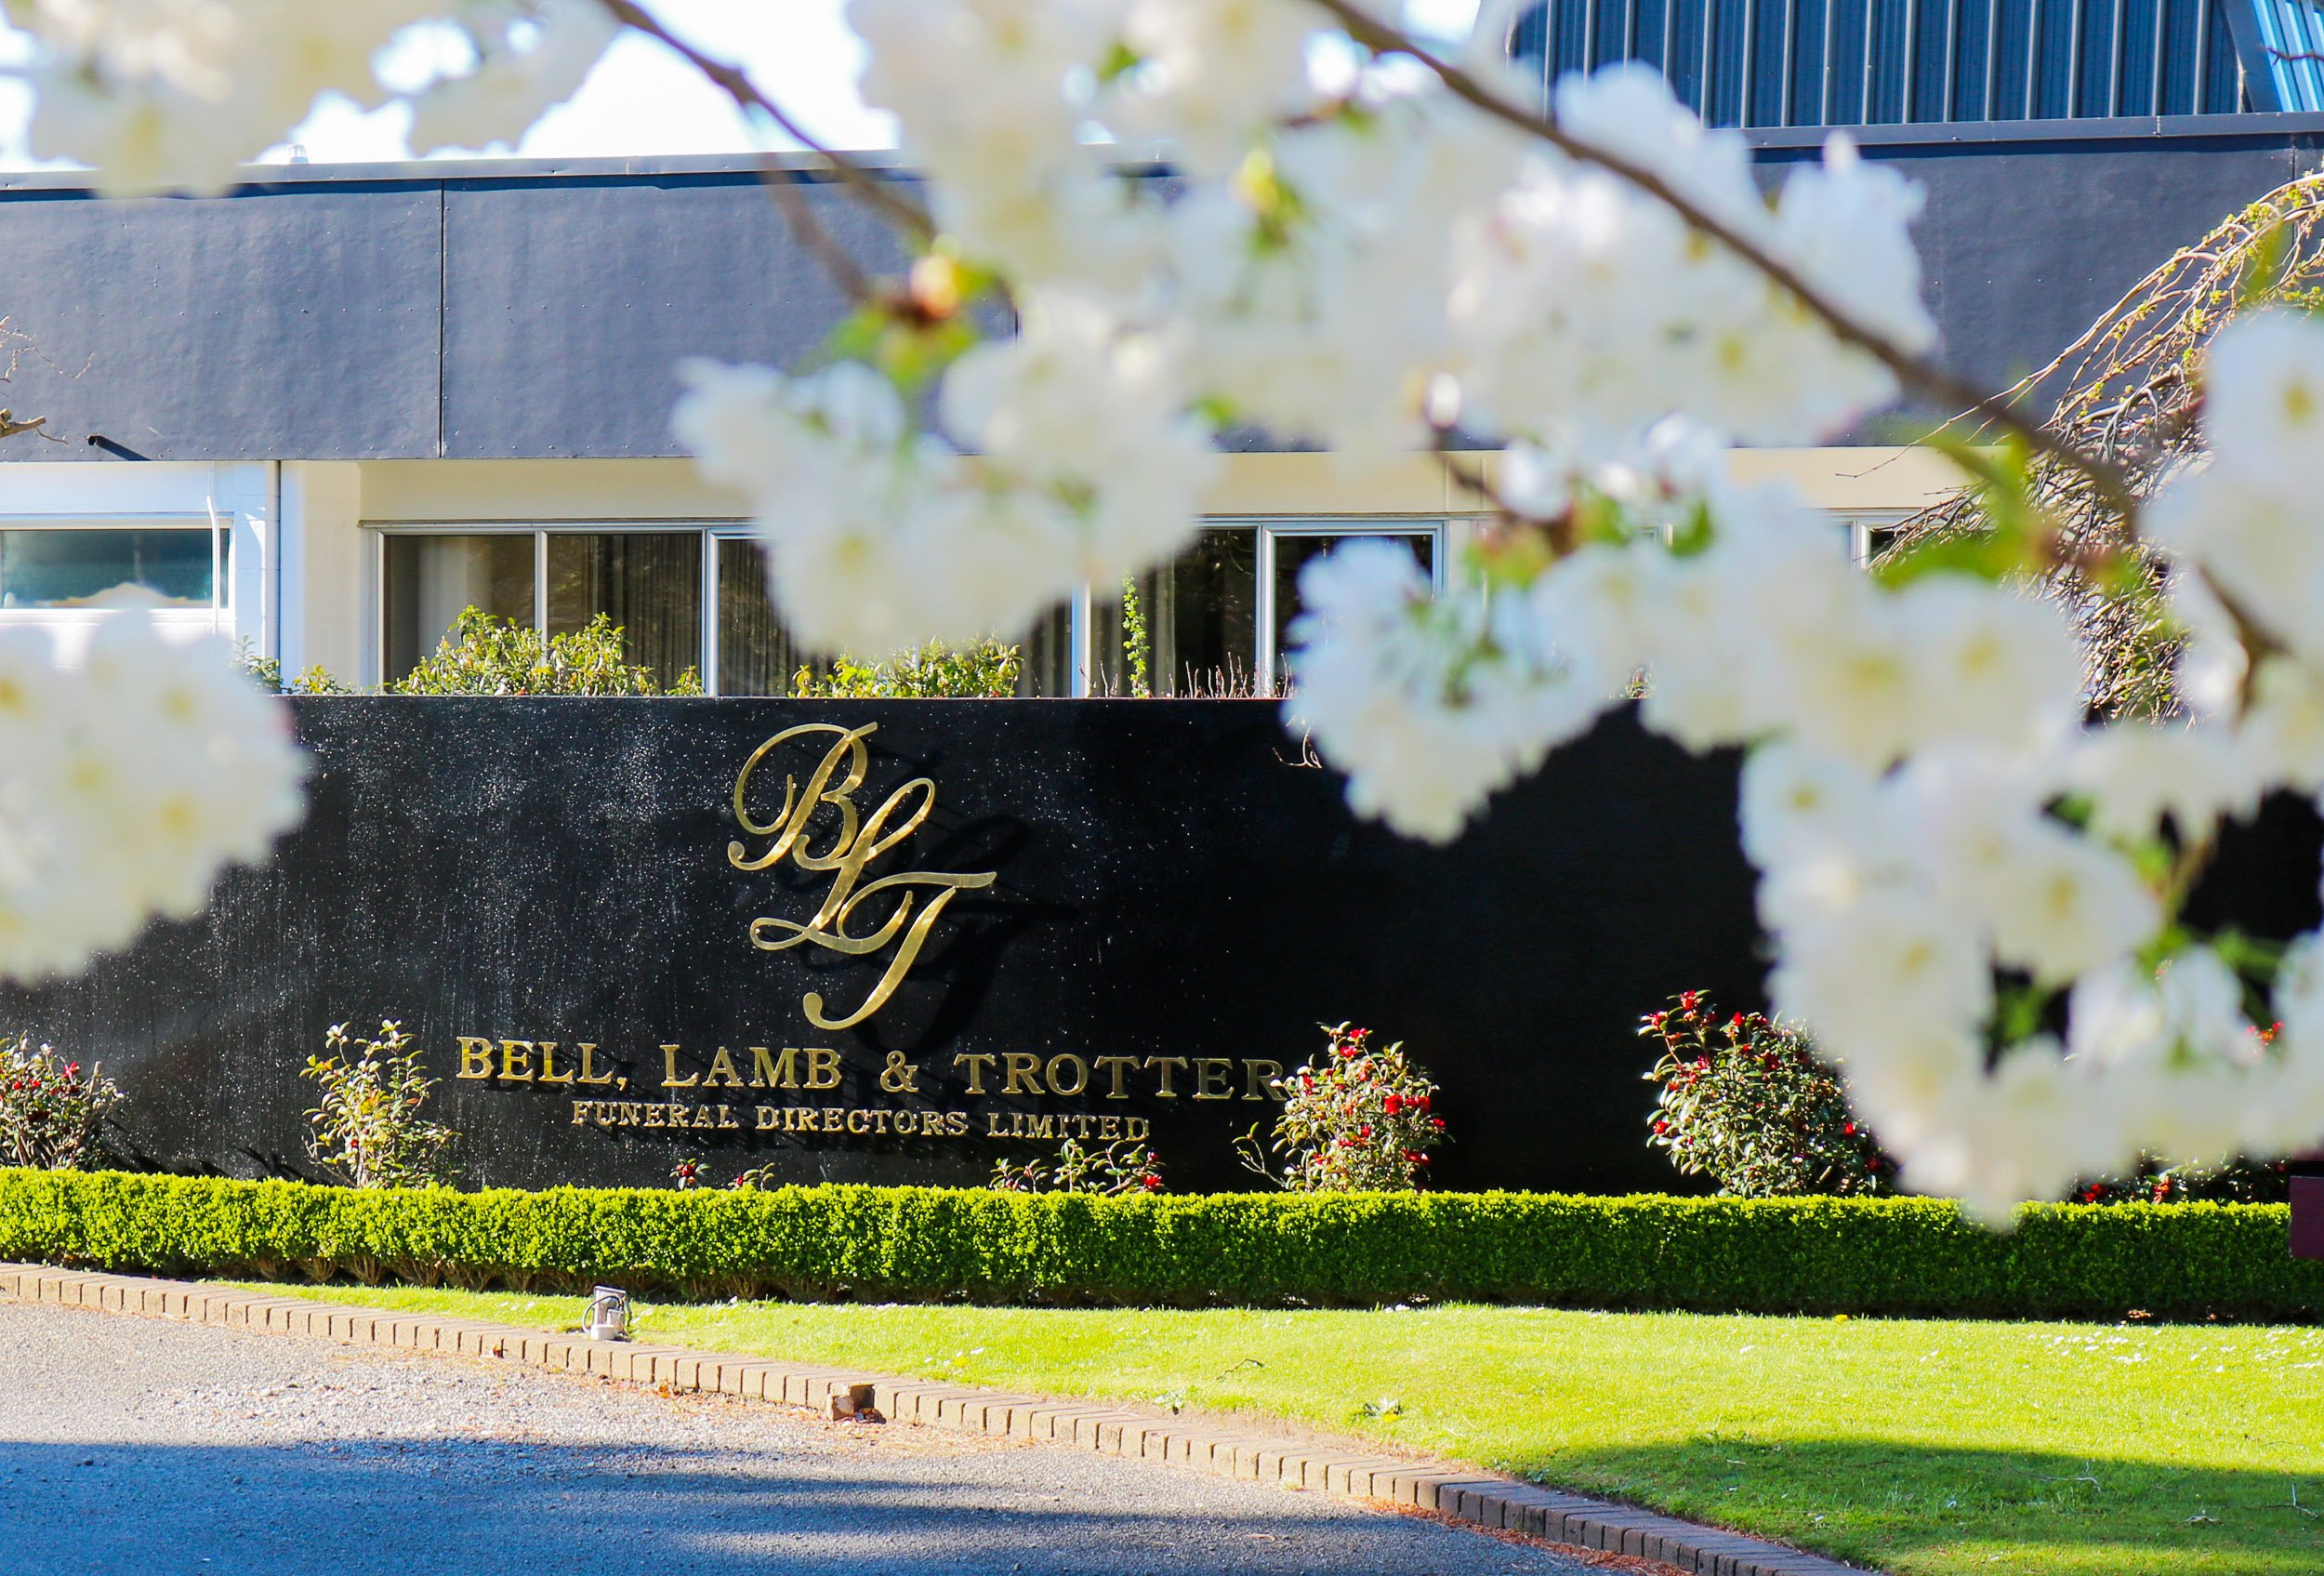 Funeral Directors | Bell, Lamb & Trotter Front Entrance